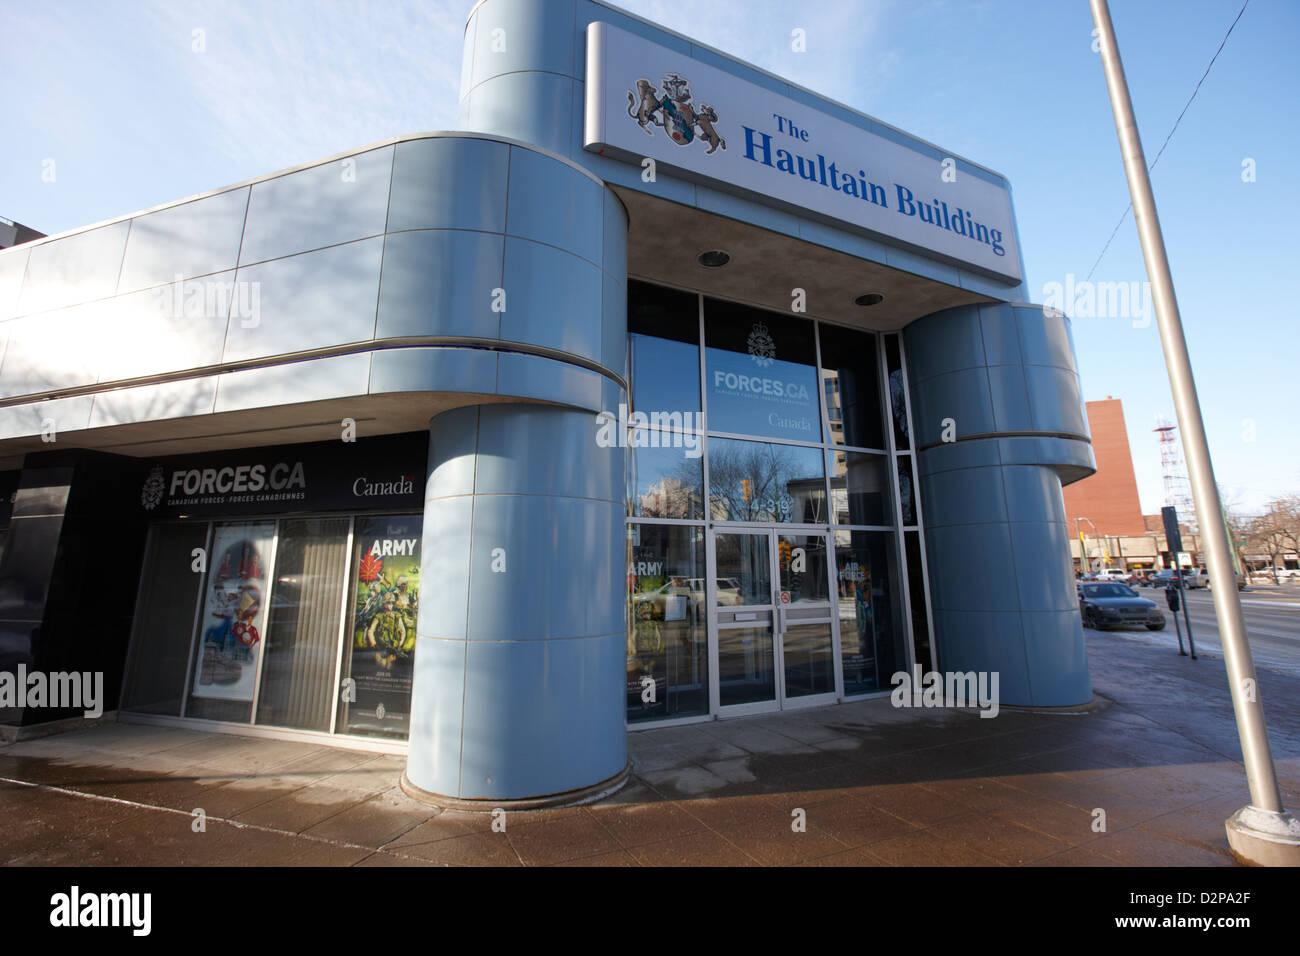 canadian armed forces recruiting office haultain building Saskatoon Saskatchewan Canada - Stock Image